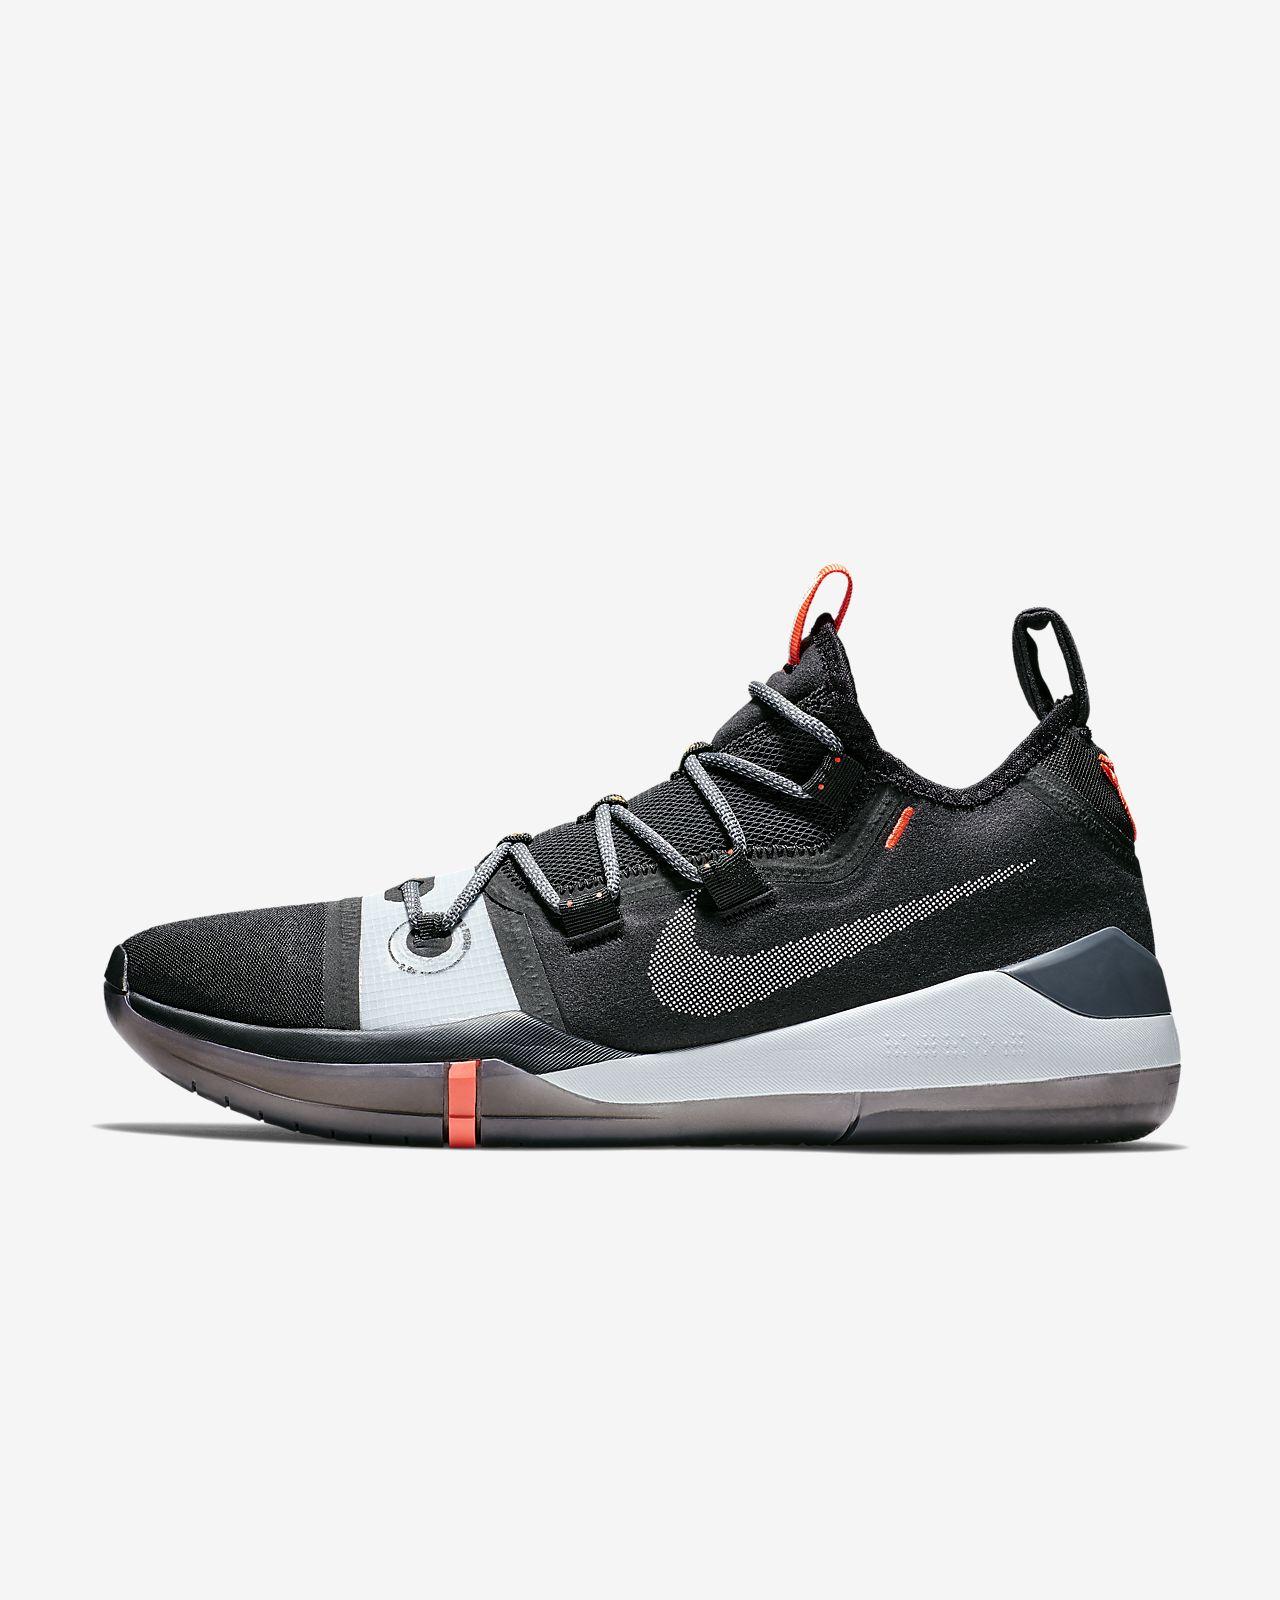 3d9cc4e06cfb netherlands nike kobe ad shoes 42e1c 7d502